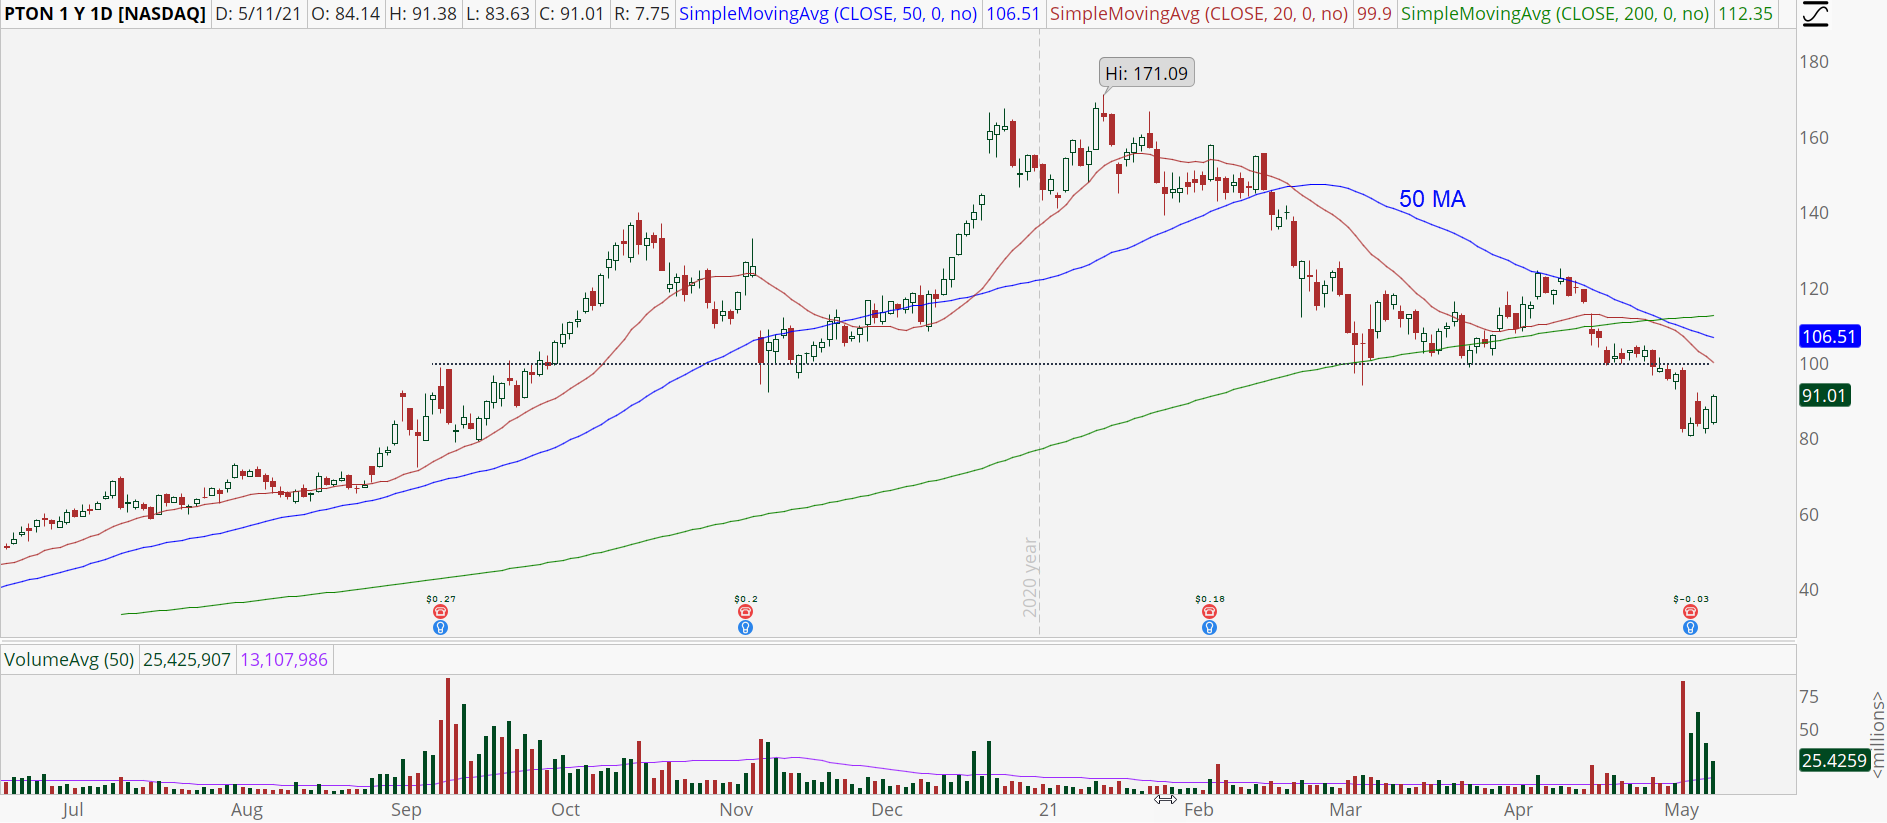 Peloton (PTON) stock chart with bear retracement pattern